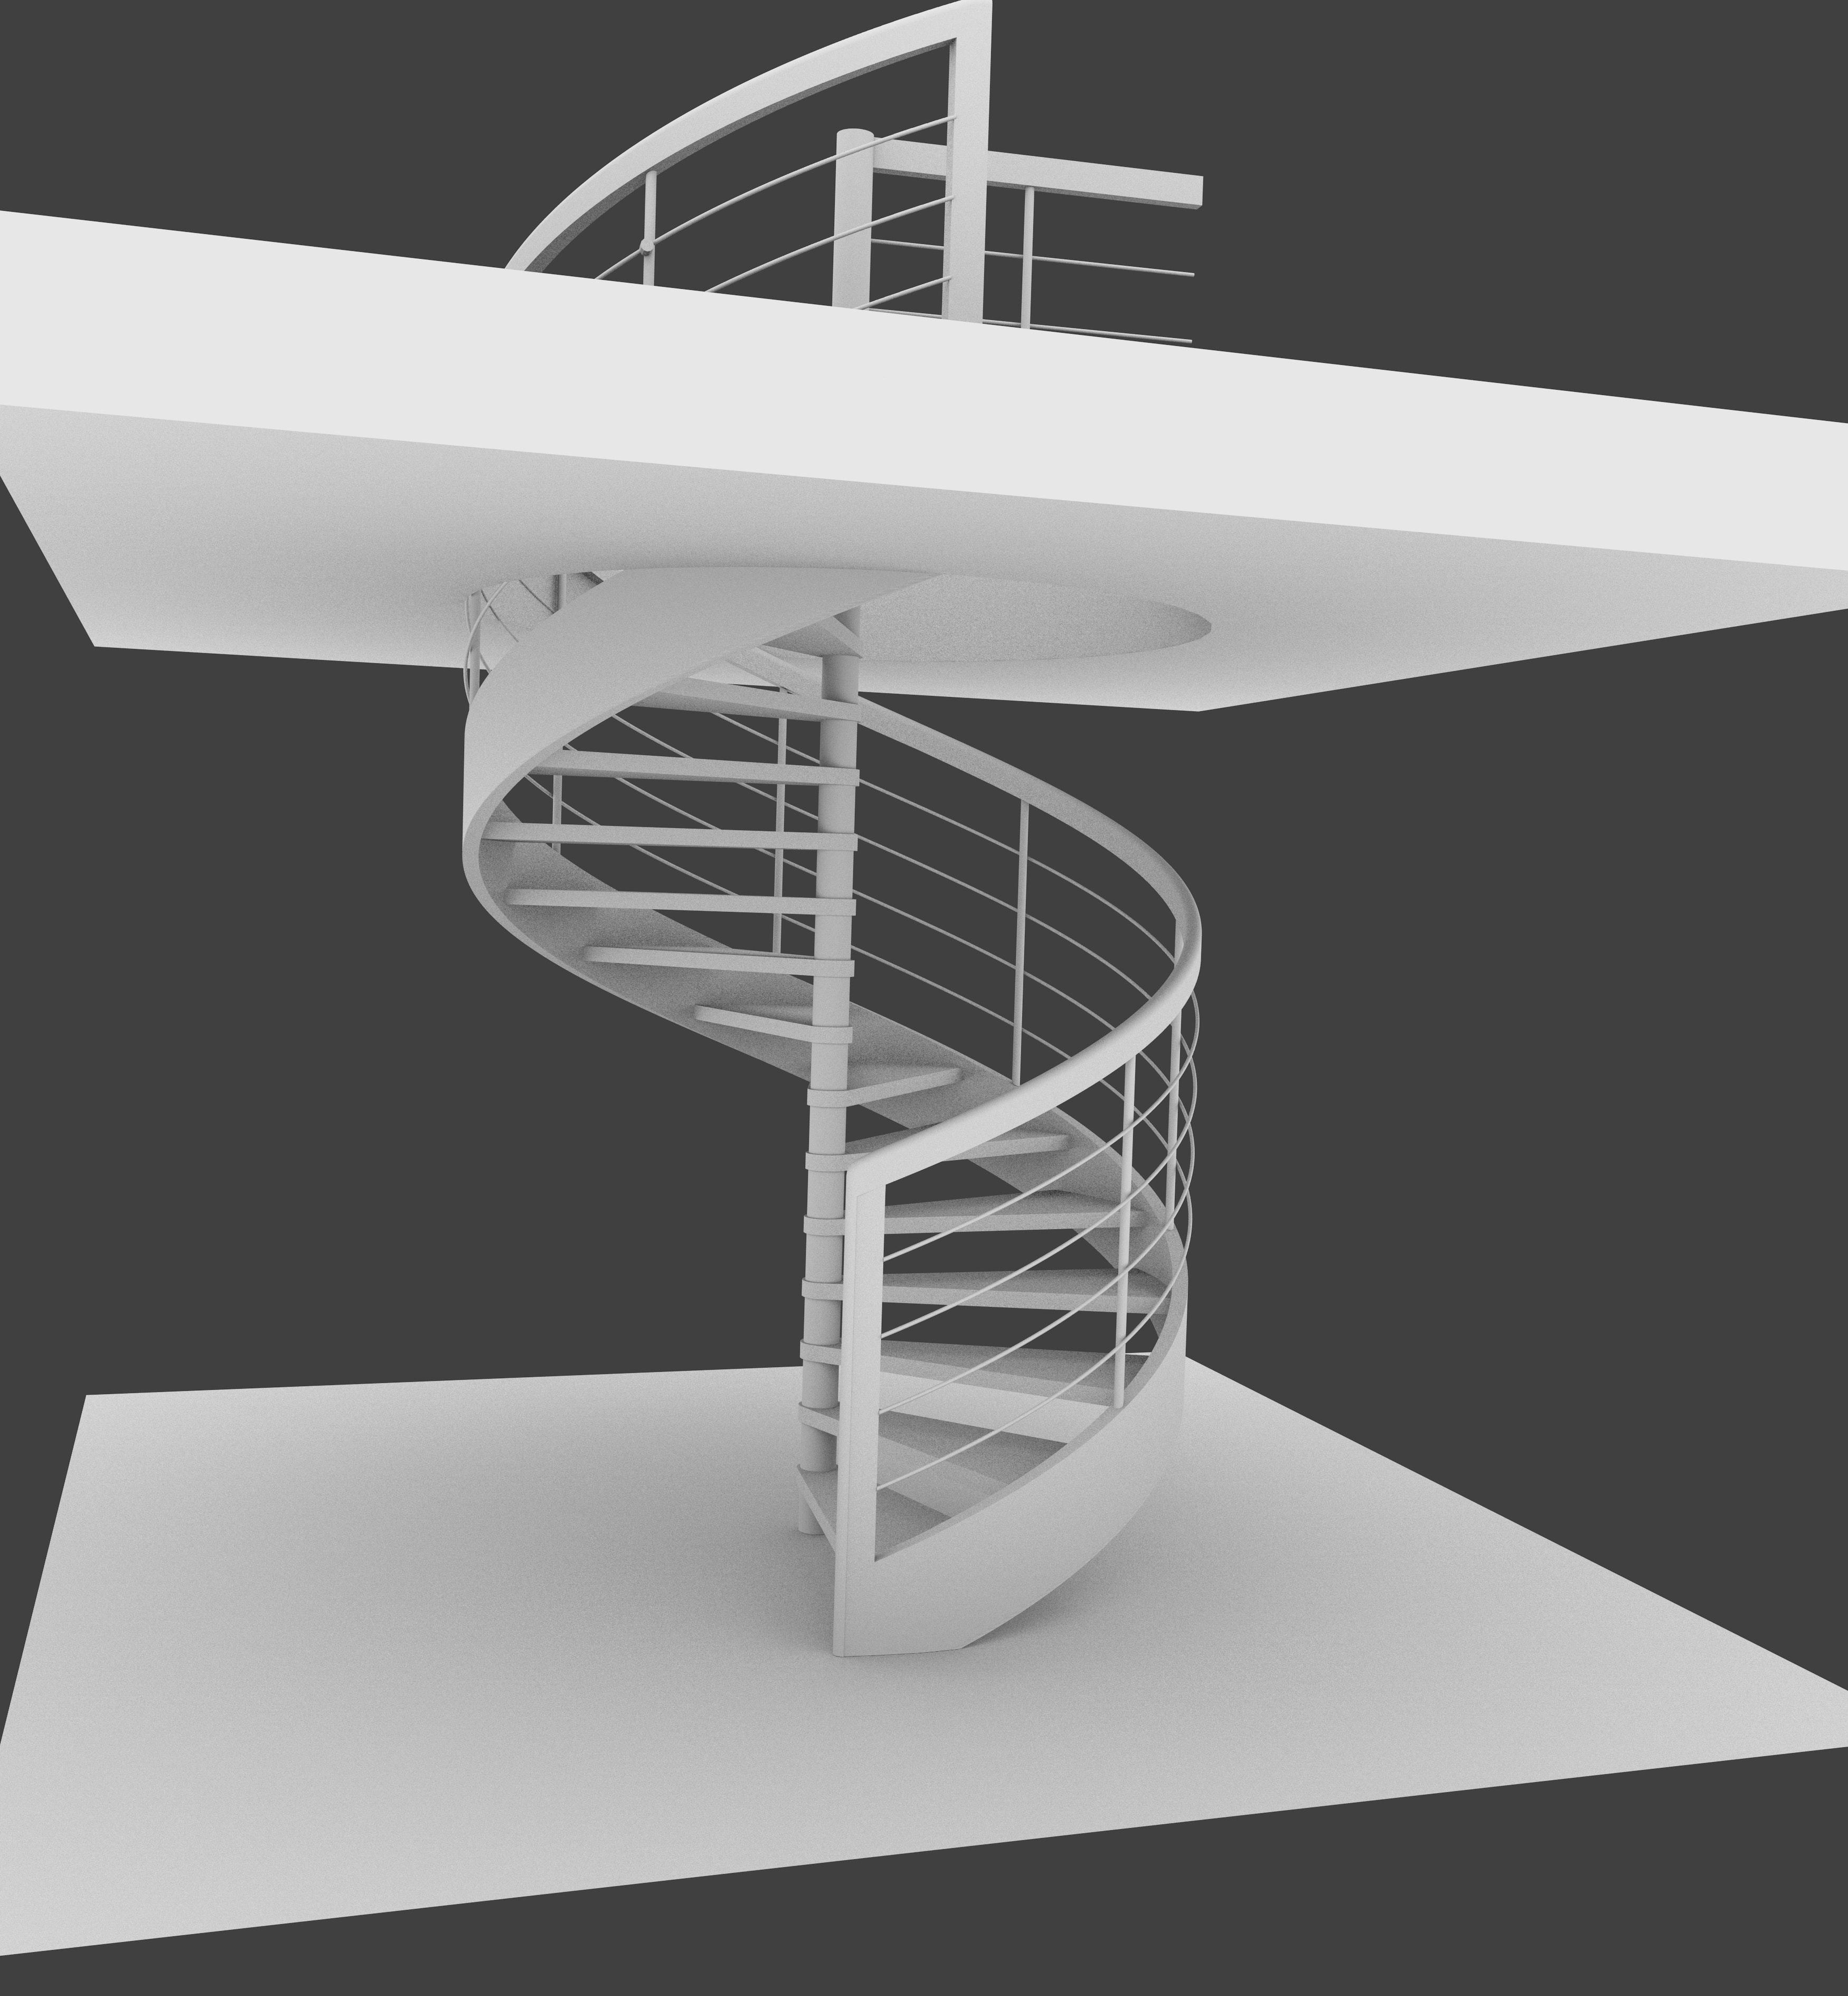 Kostenloses Foto Zum Thema Haustreppen Stahltreppe Stufe Stufen